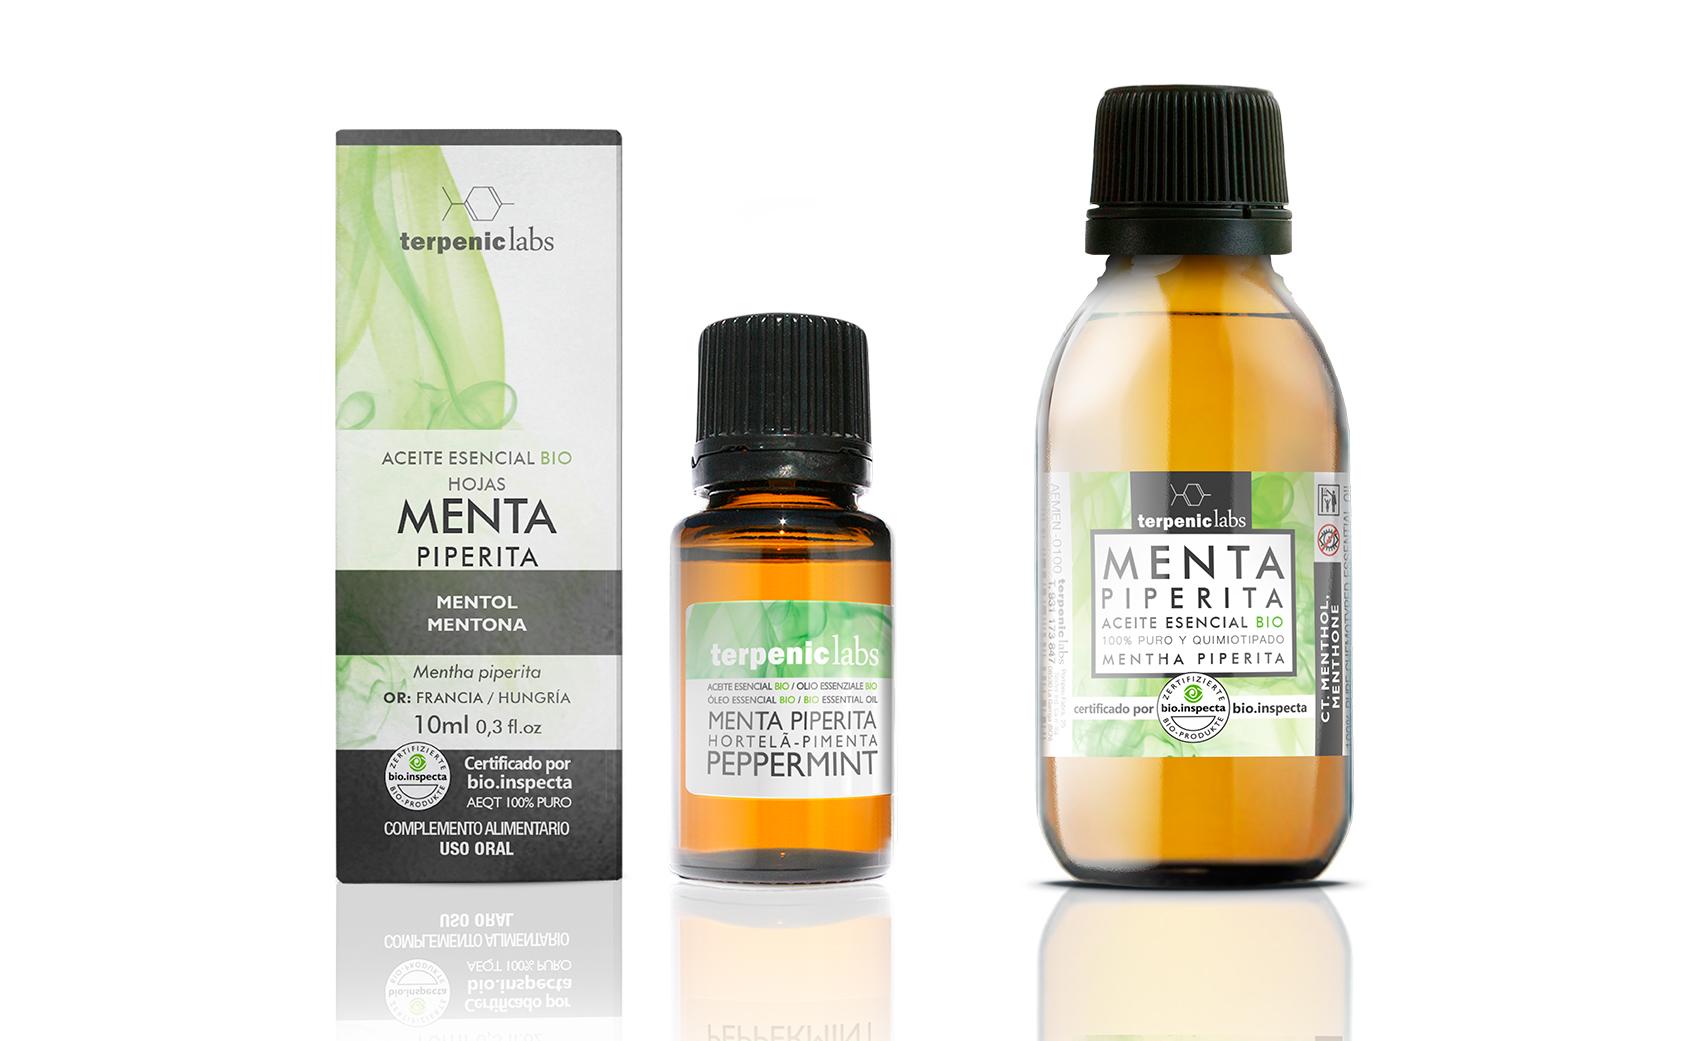 Menta Piperita - Aceite Esencial